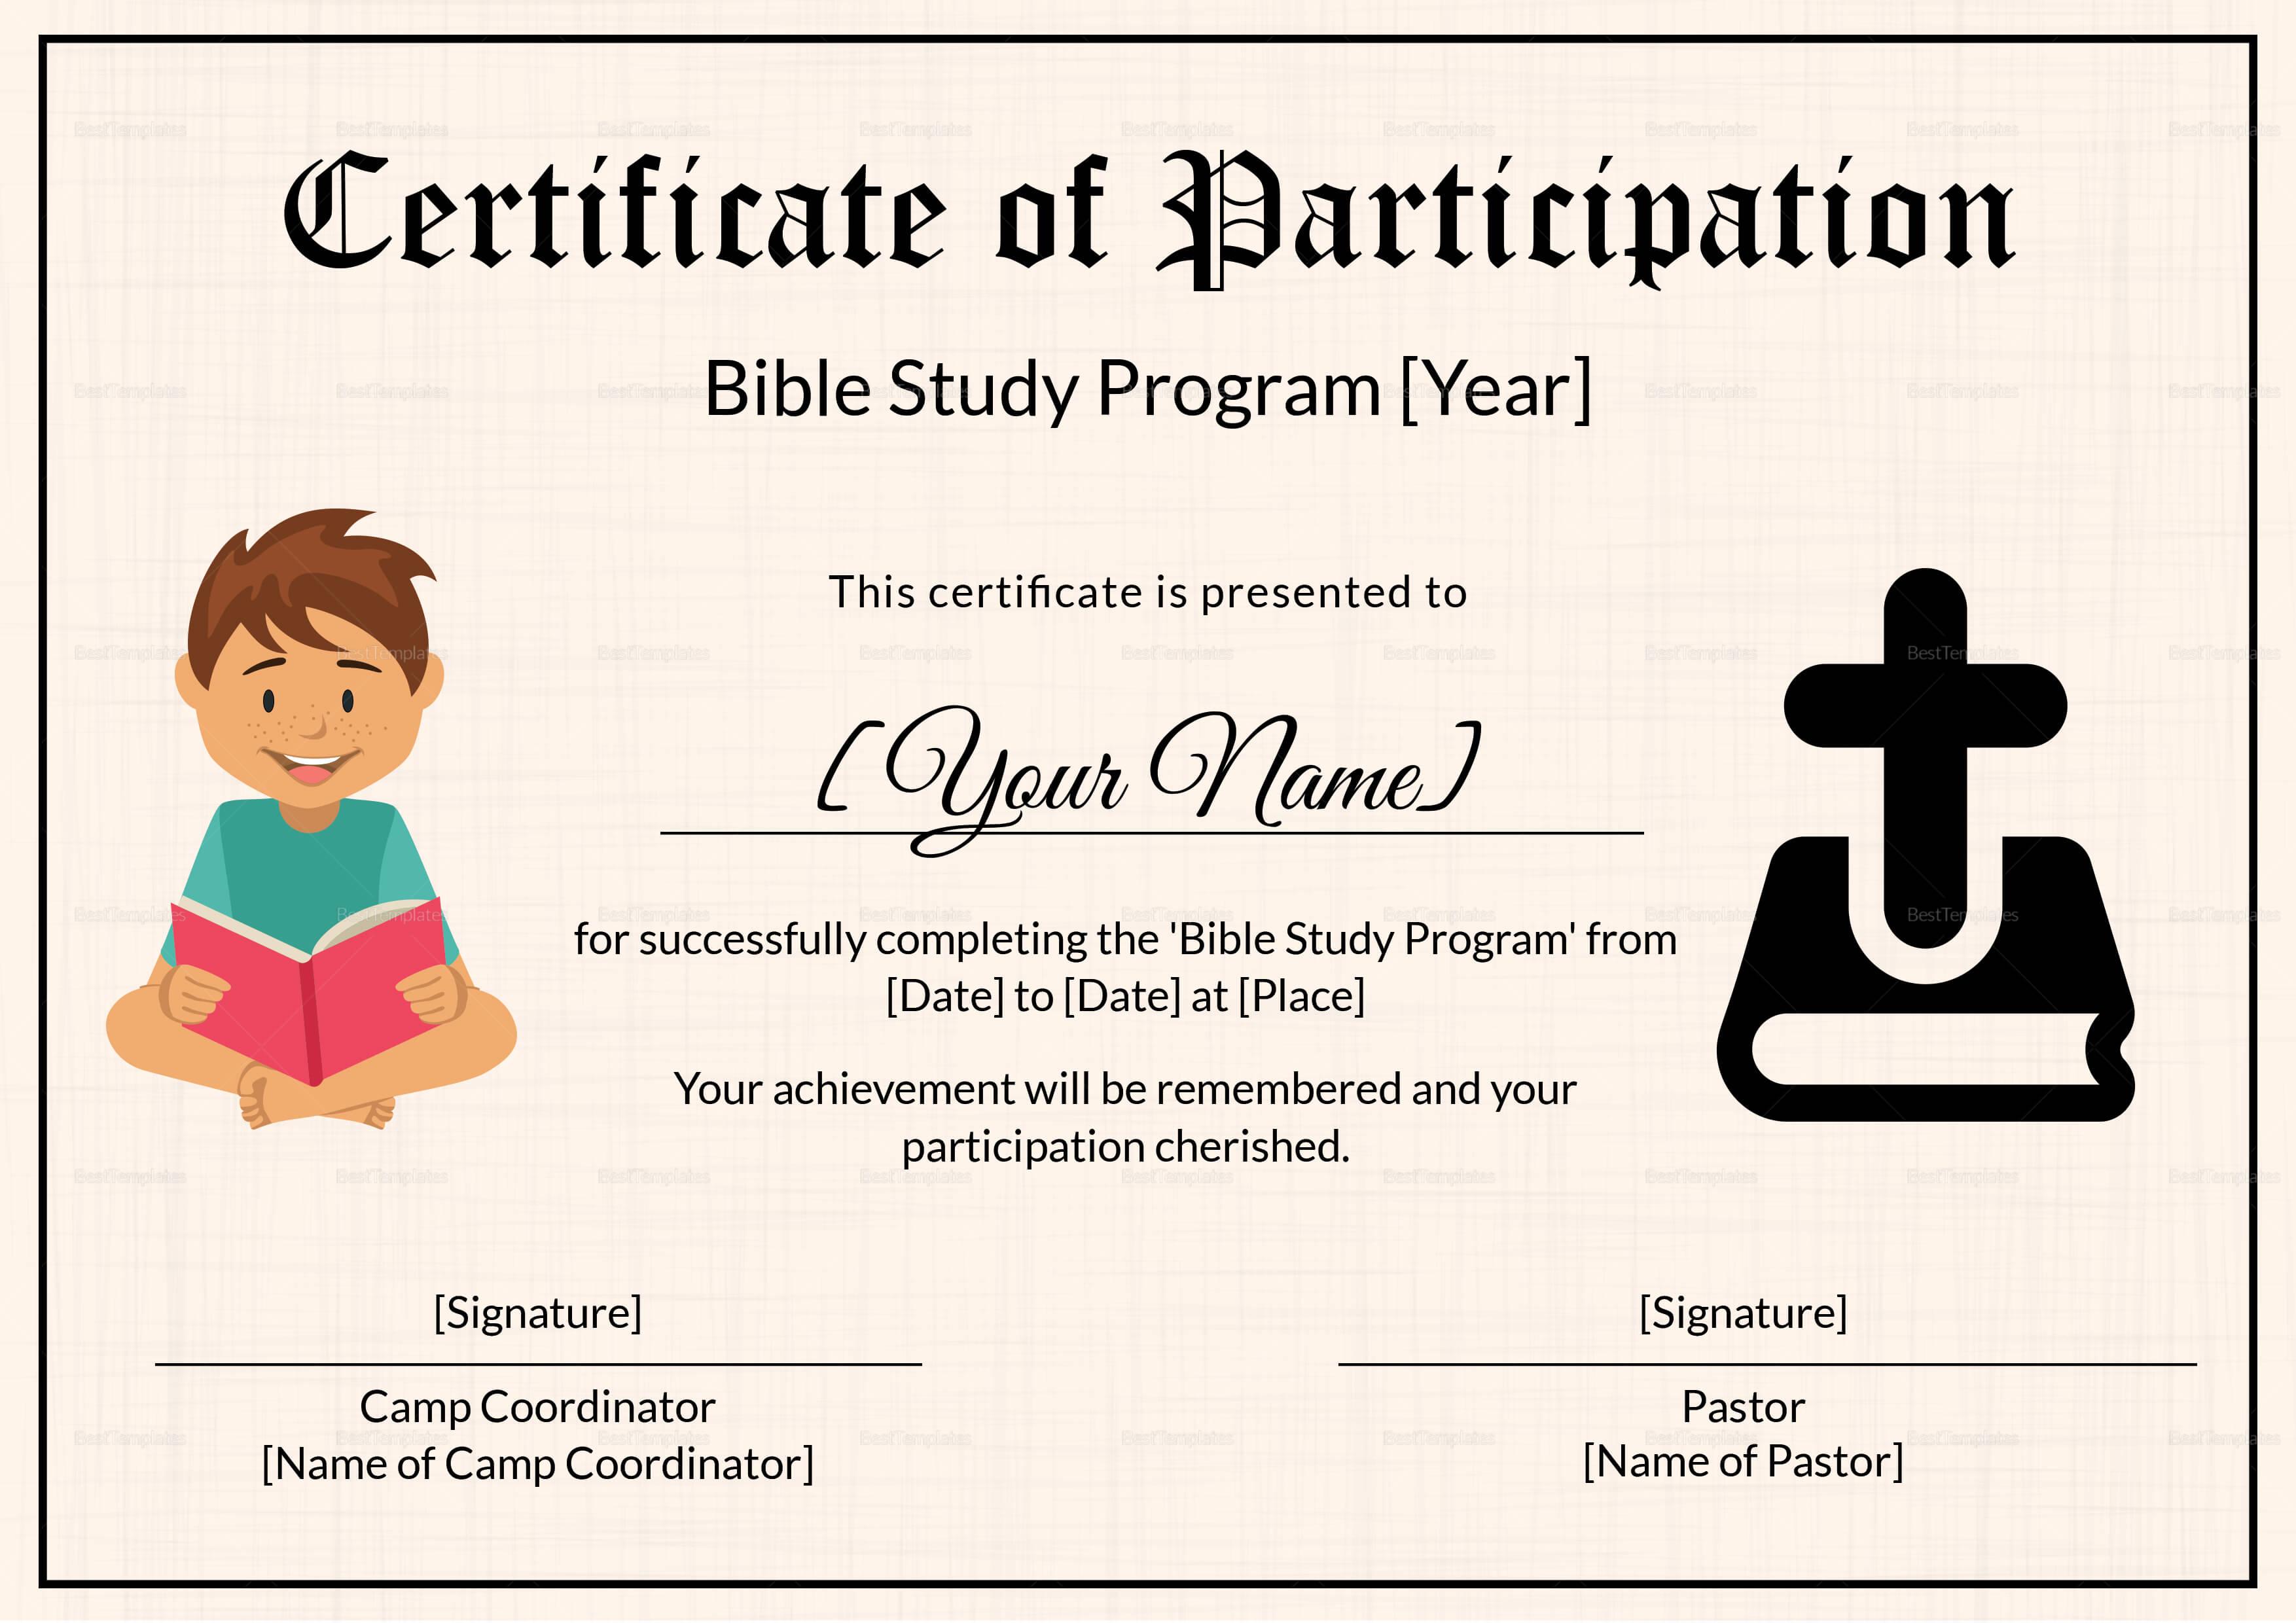 Bible Prophecy Program Certificate For Kids Template Regarding Christian Certificate Template